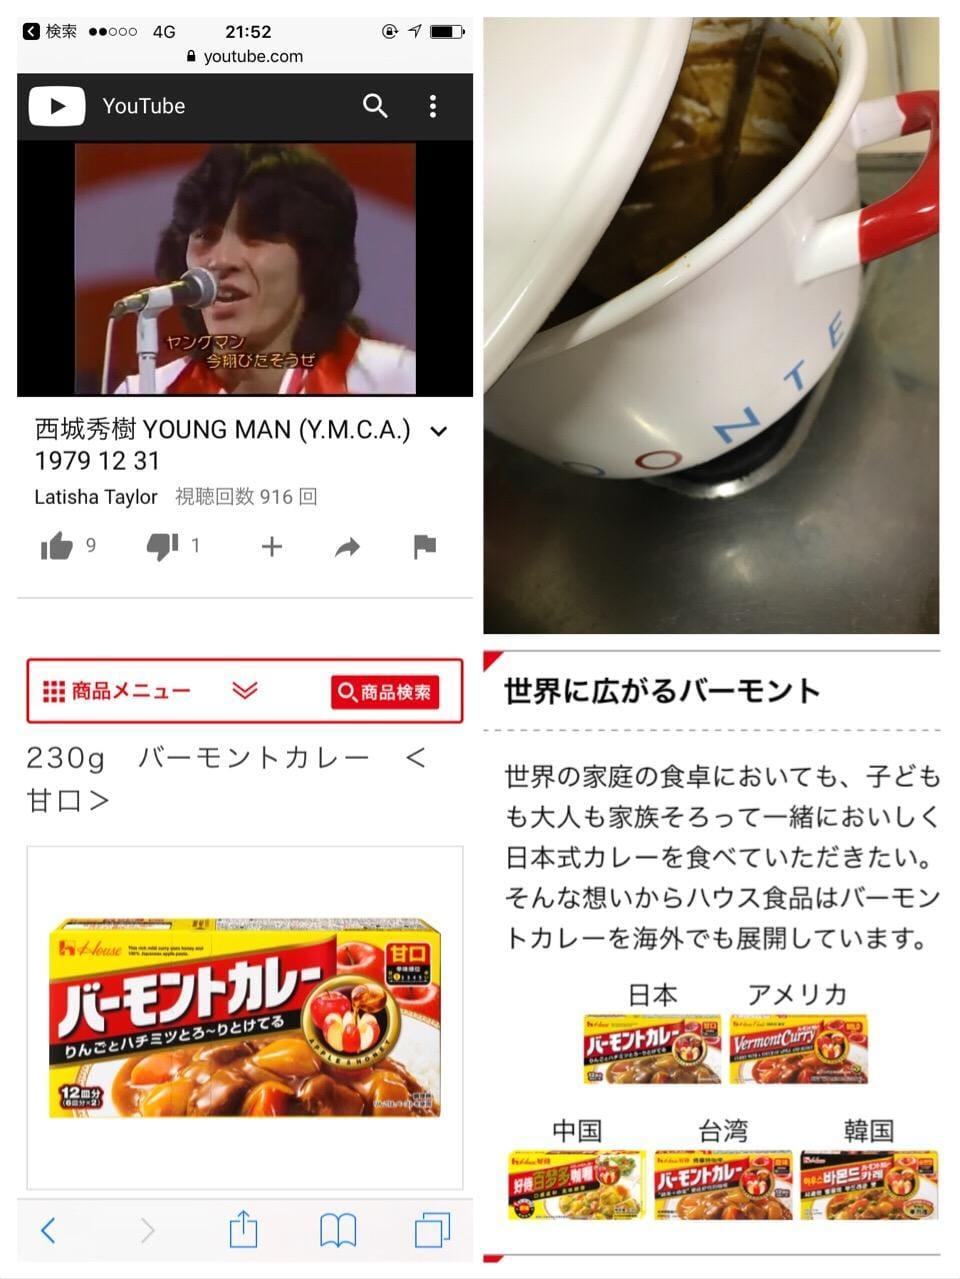 https://s3-ap-northeast-1.amazonaws.com/files.deli-fuzoku.jp/img/shop/celebbijin/diary/23656608/d_0_20180520220249359.JPG